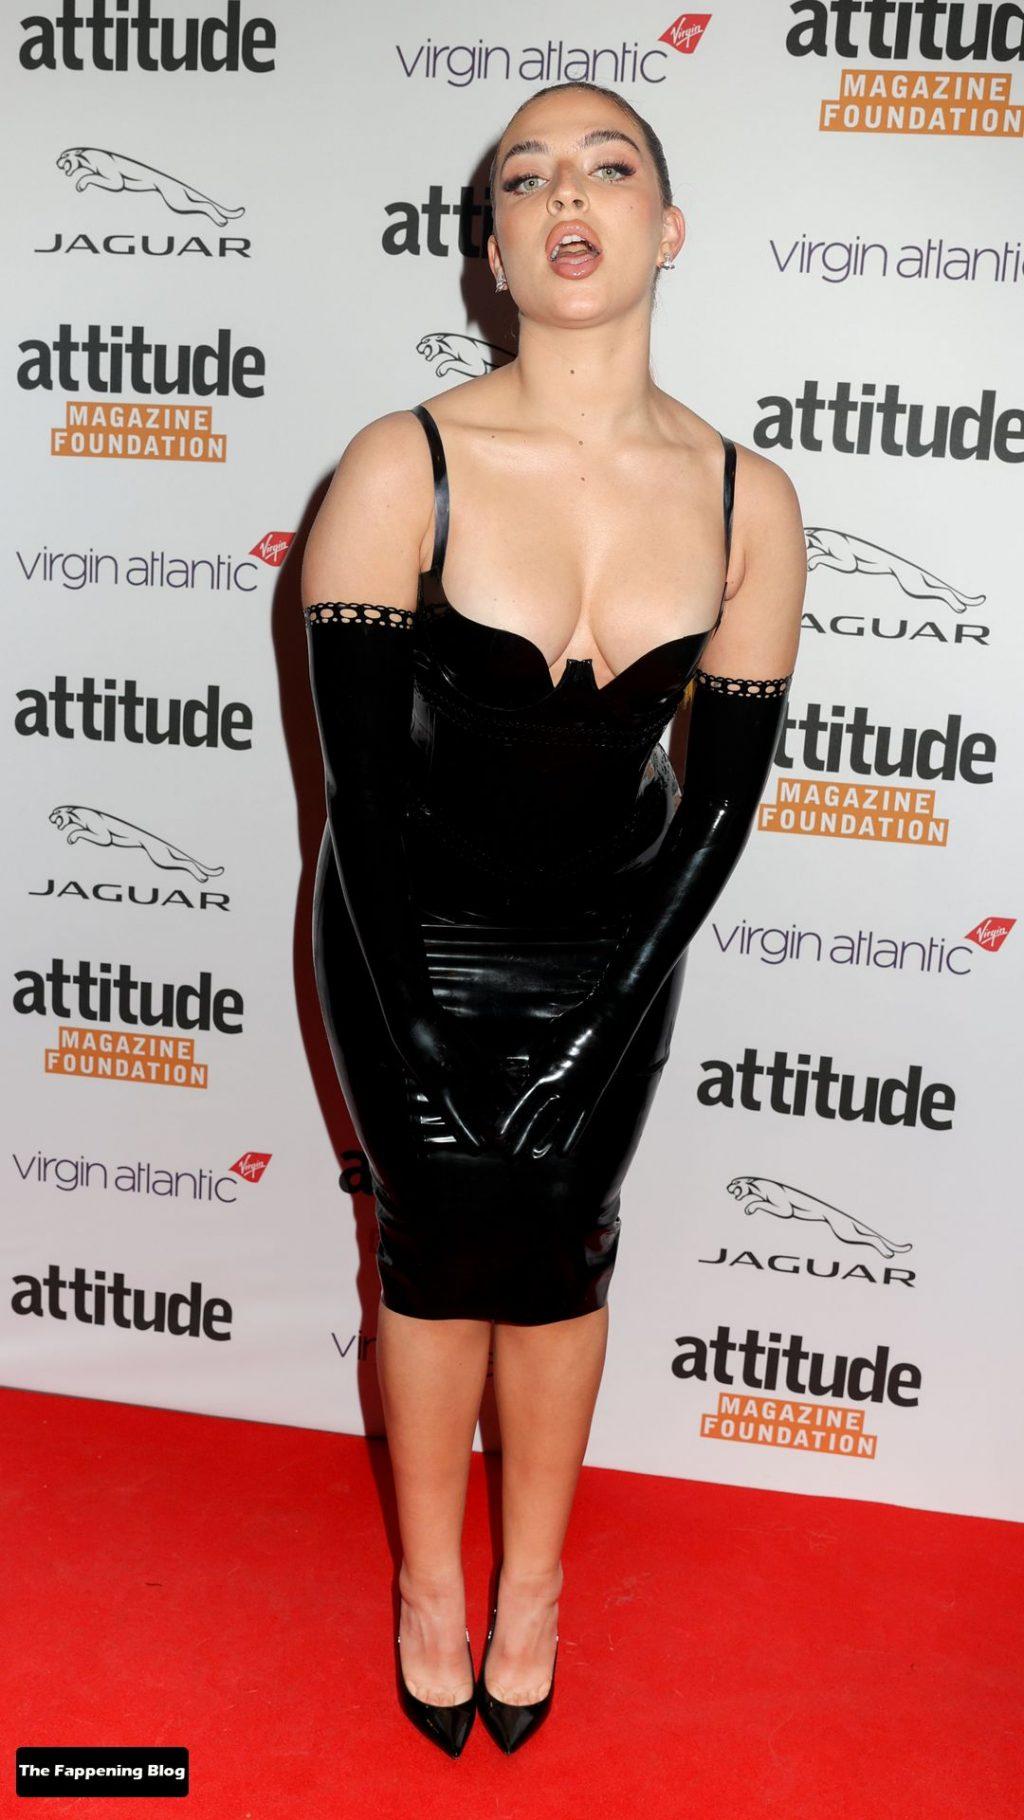 Mae Muller Shows Off Her Tits at The Virgin Atlantic Attitude Awards (8 Photos + Video)